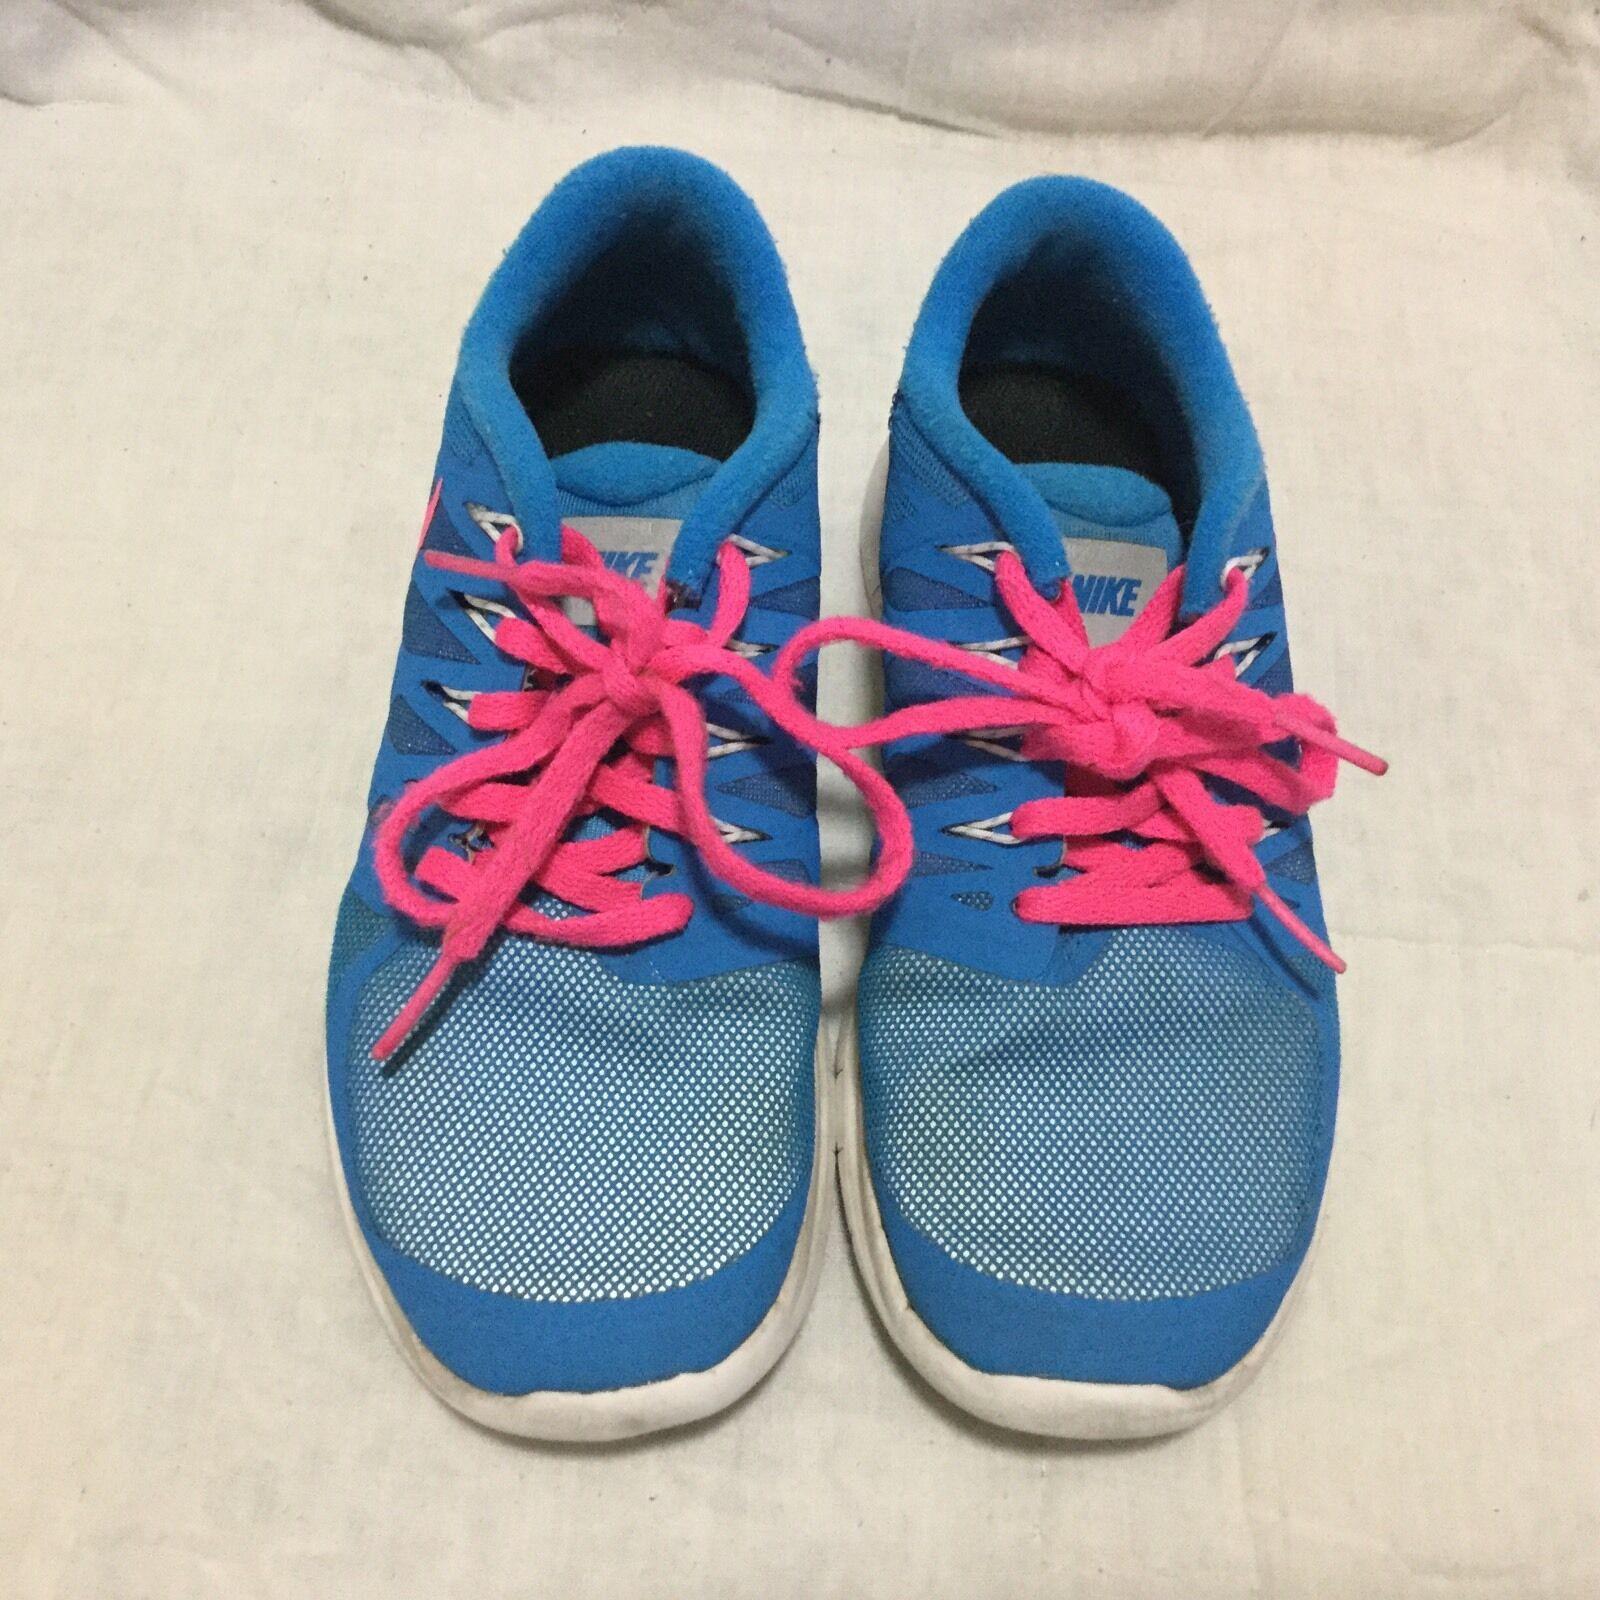 nike id libera 5,0 h2o respingere scarpette rosa - bianco bianco bianco - blu (misura 5,5) donne. | Qualità Primacy  | Uomo/Donna Scarpa  e055da